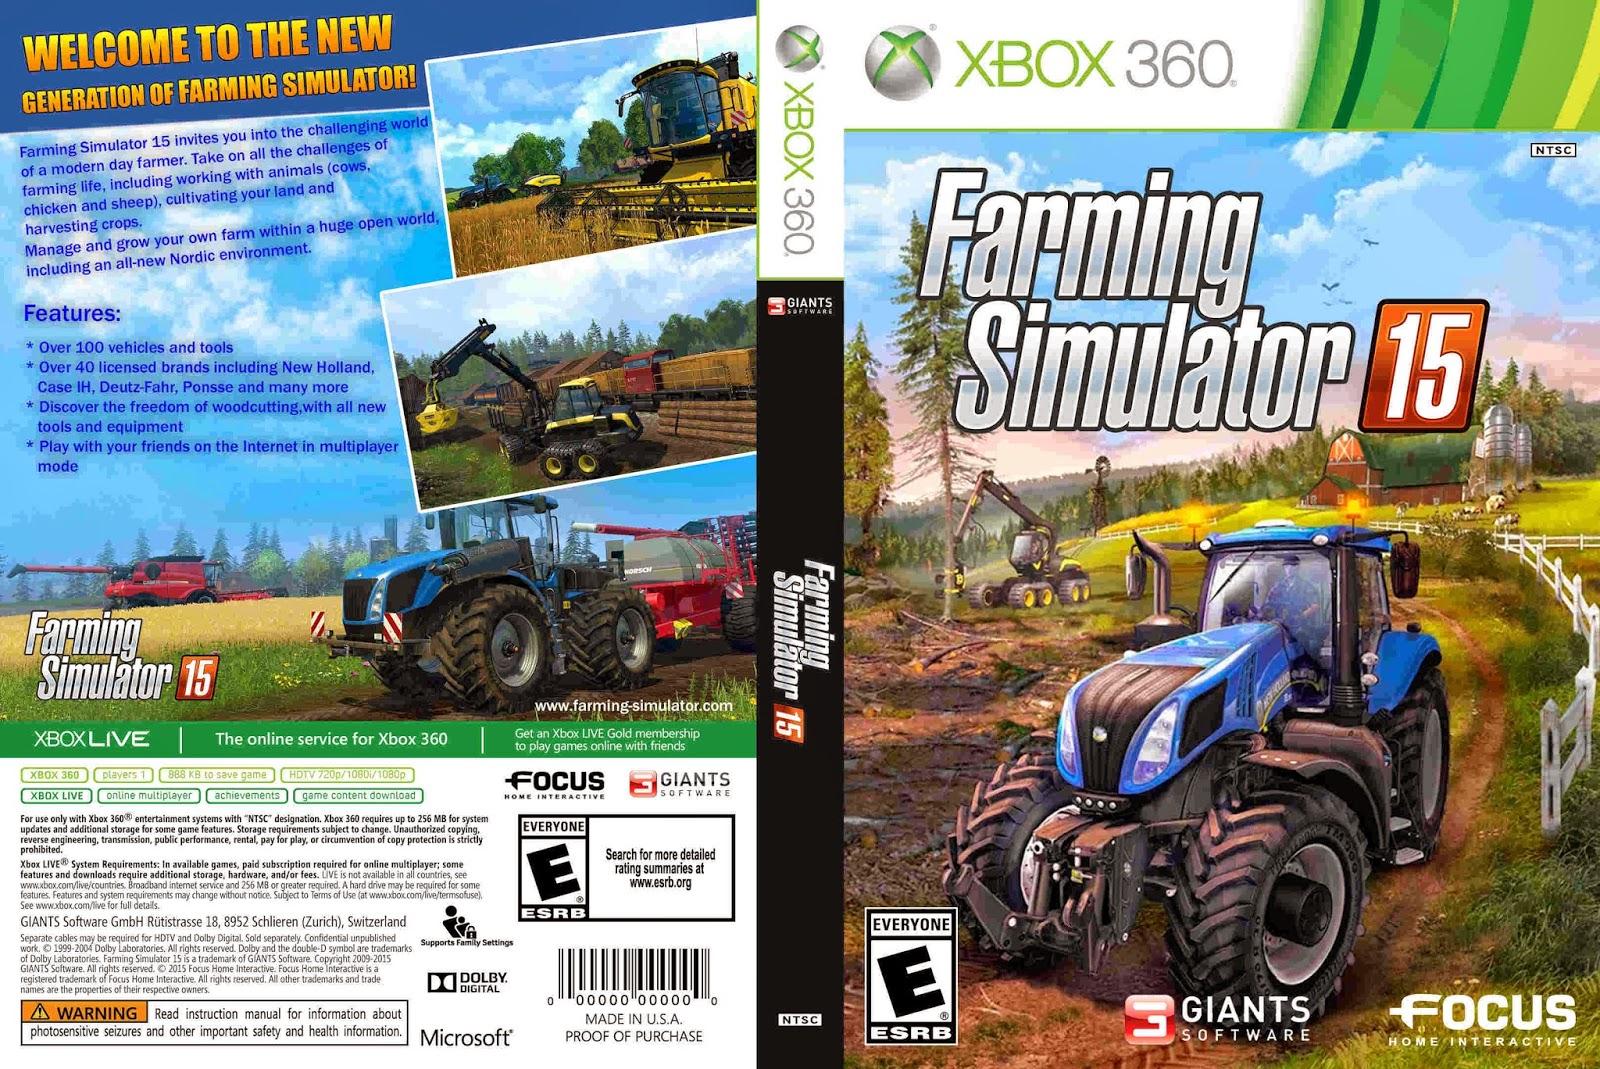 Farming simulator 15 xbox 360 game